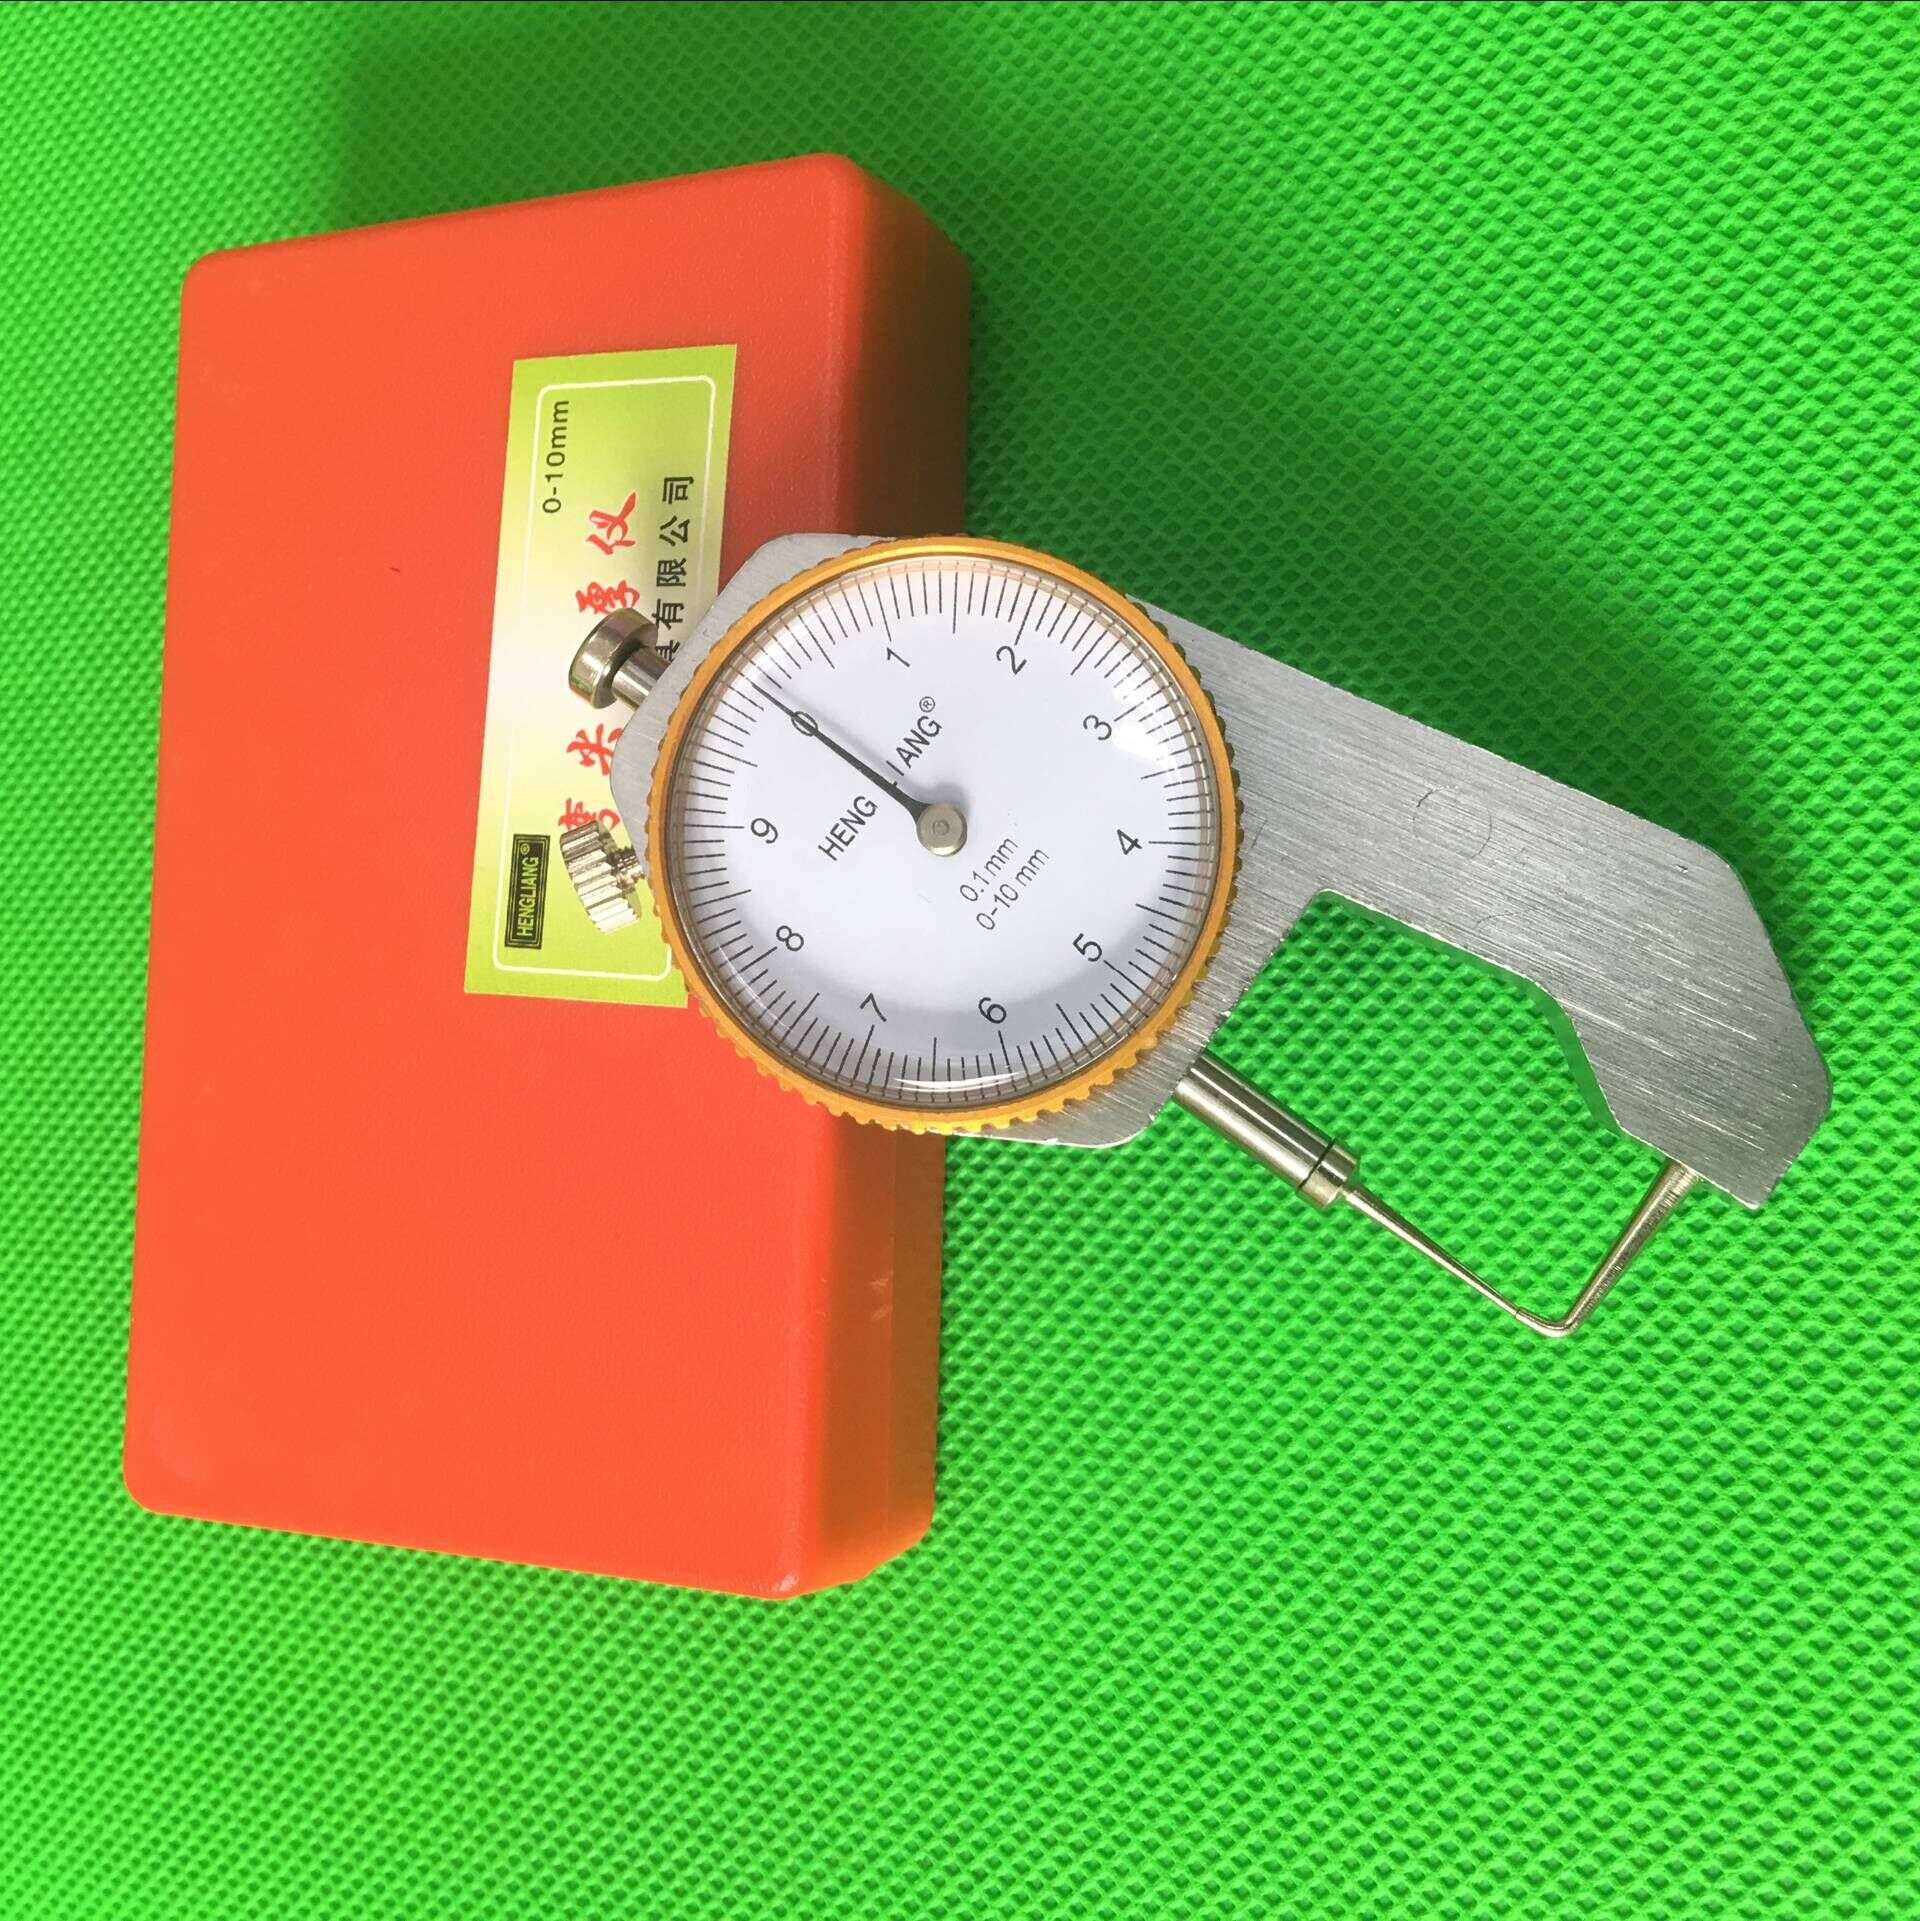 Dental Lab Caliper Measuring Precision 0-10*0.1mm Thickness Instrument Sharp Metal Watch Show Thickness Gauge